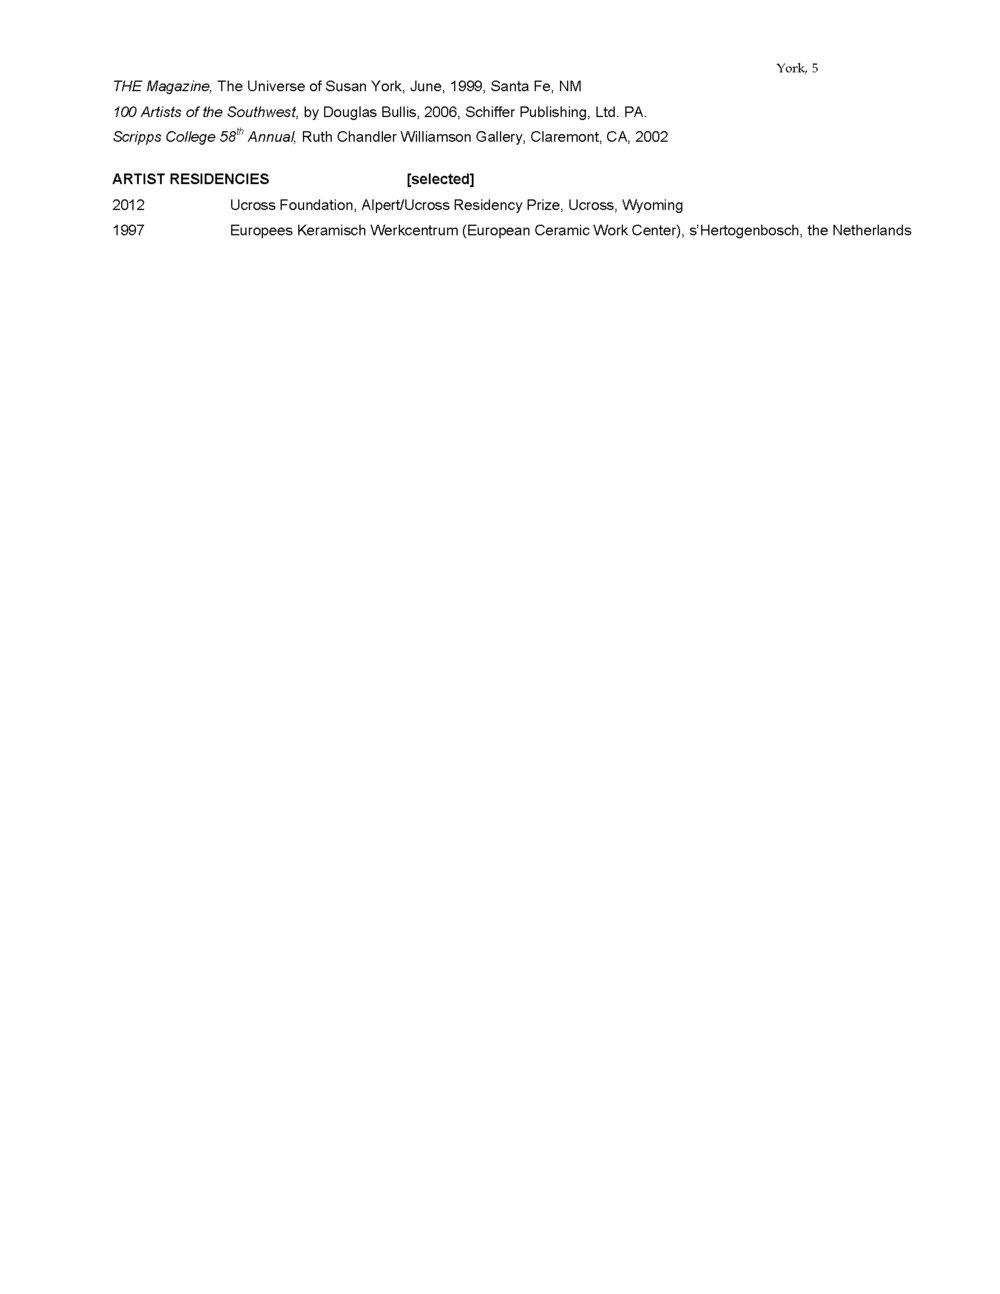 artist resume 6_17_Page_5.jpg